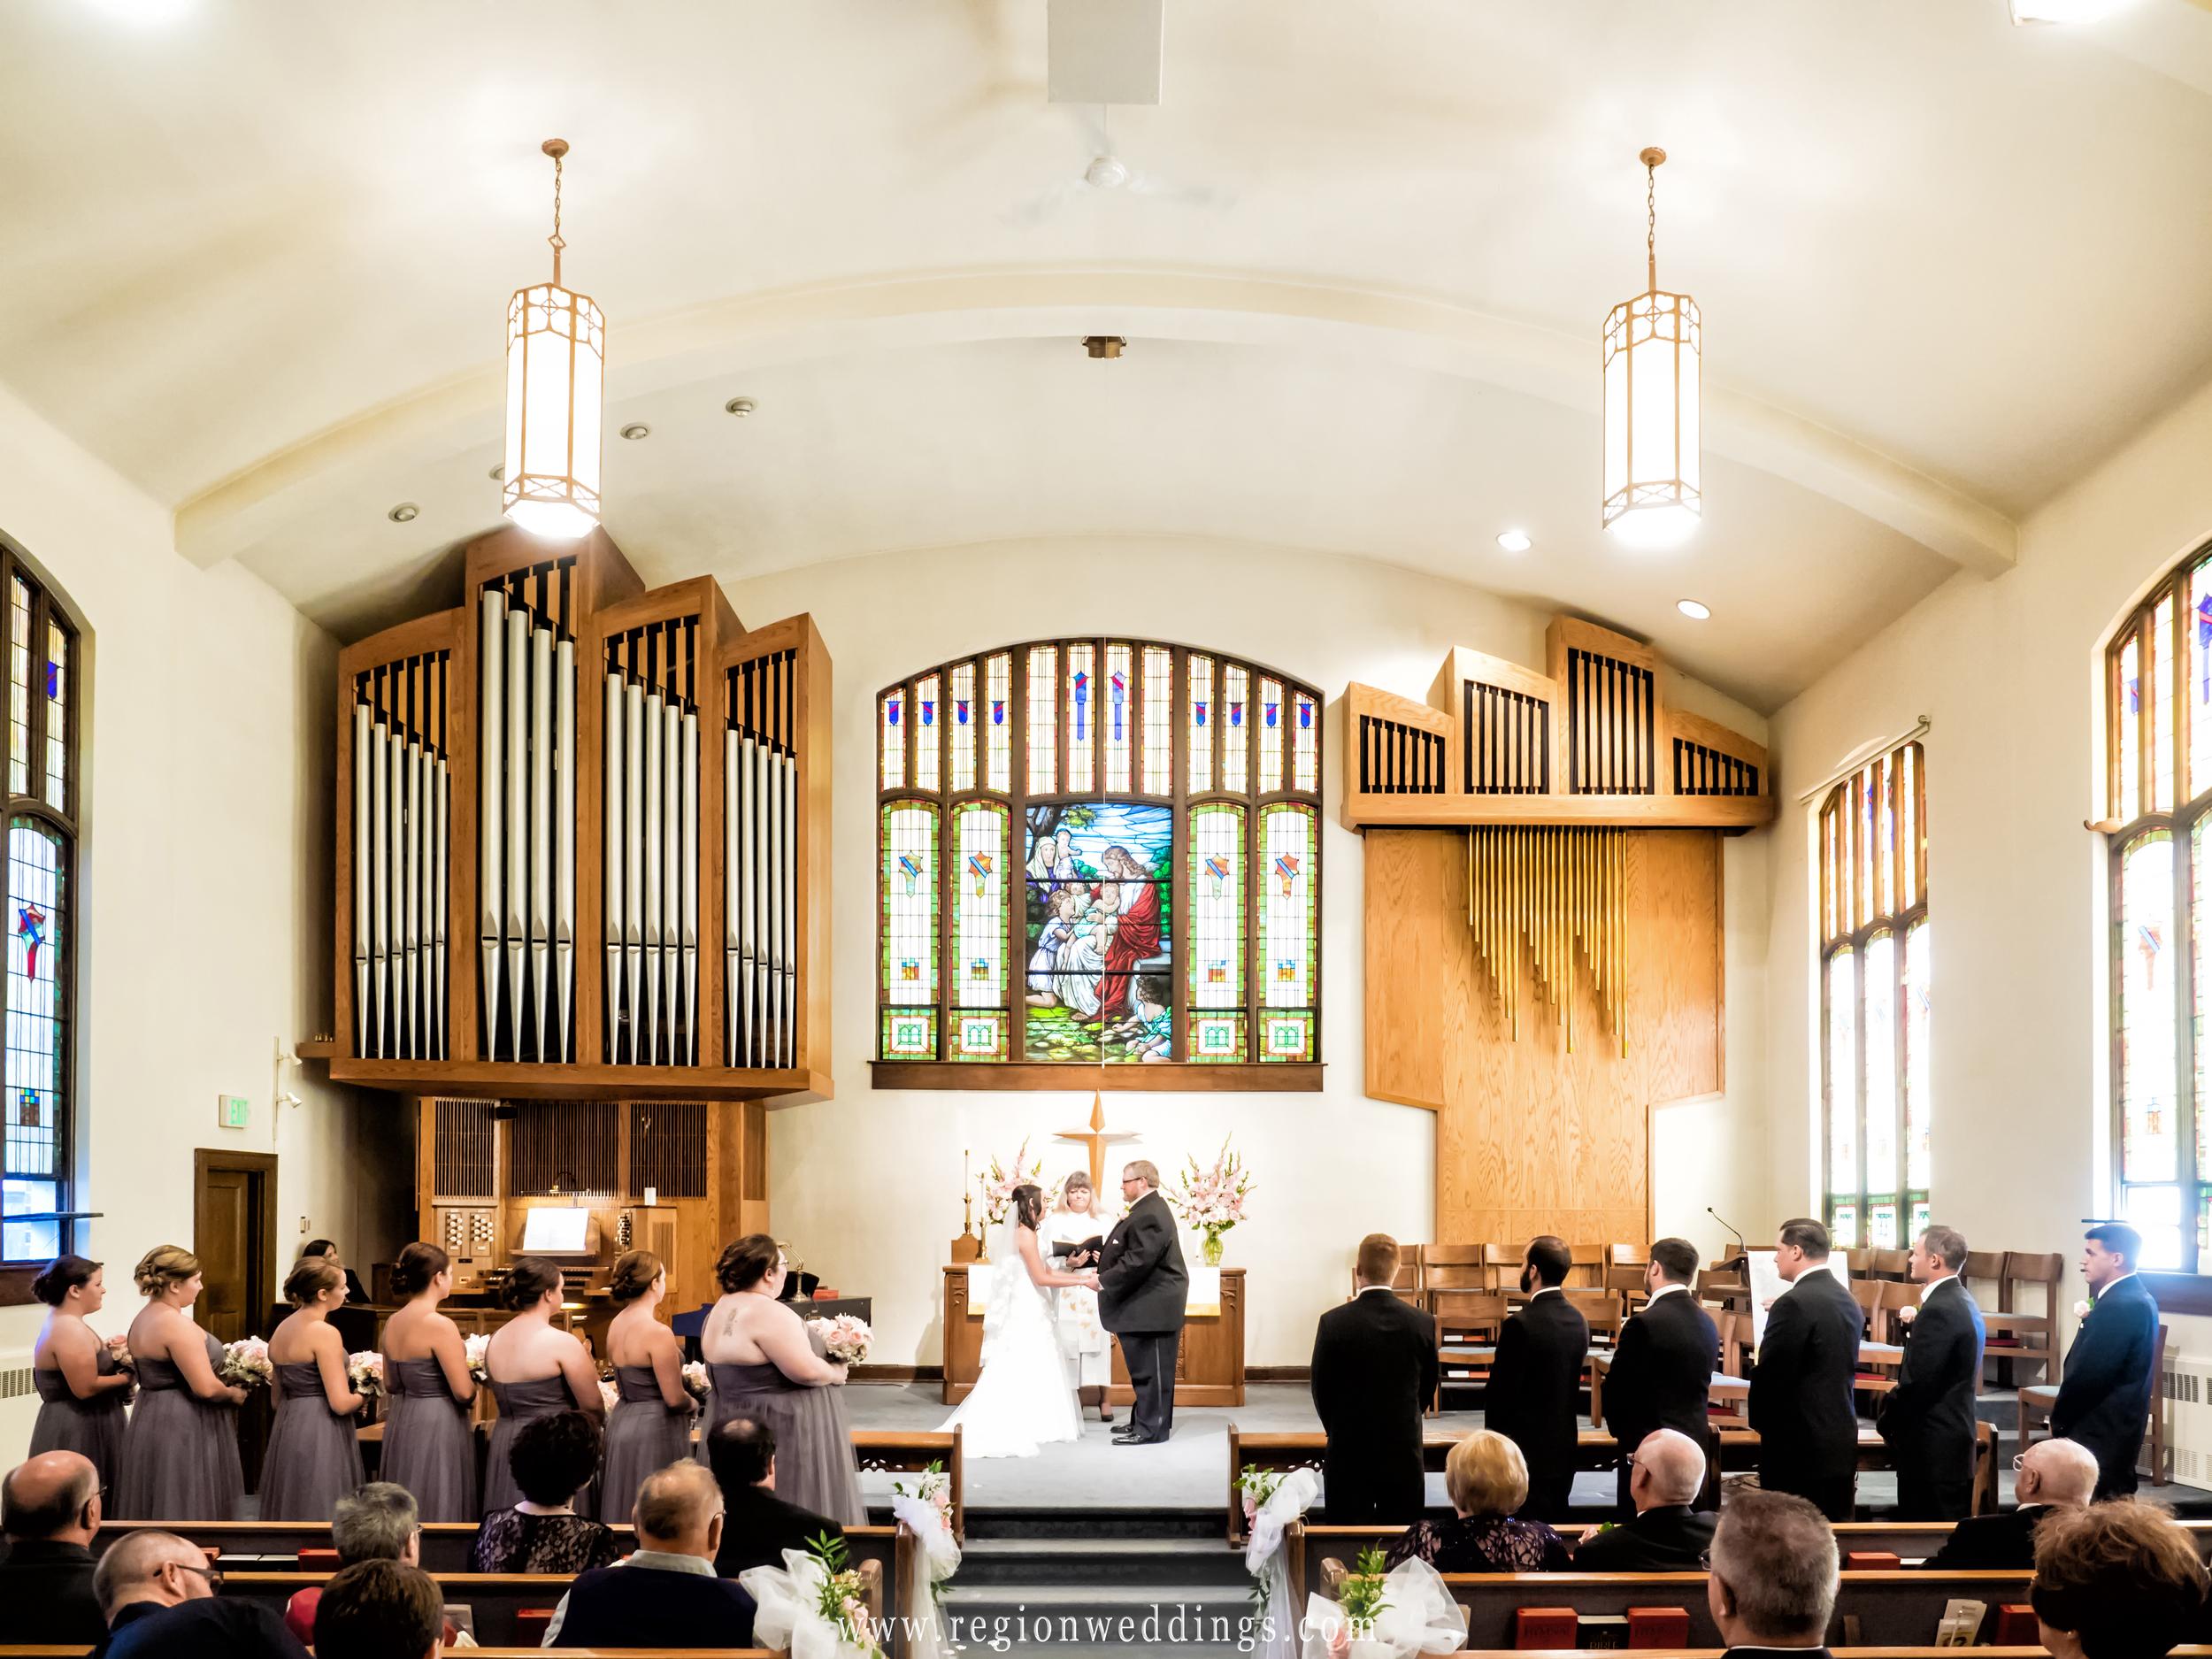 Wedding ceremony at Chesterton United Methodist Church.